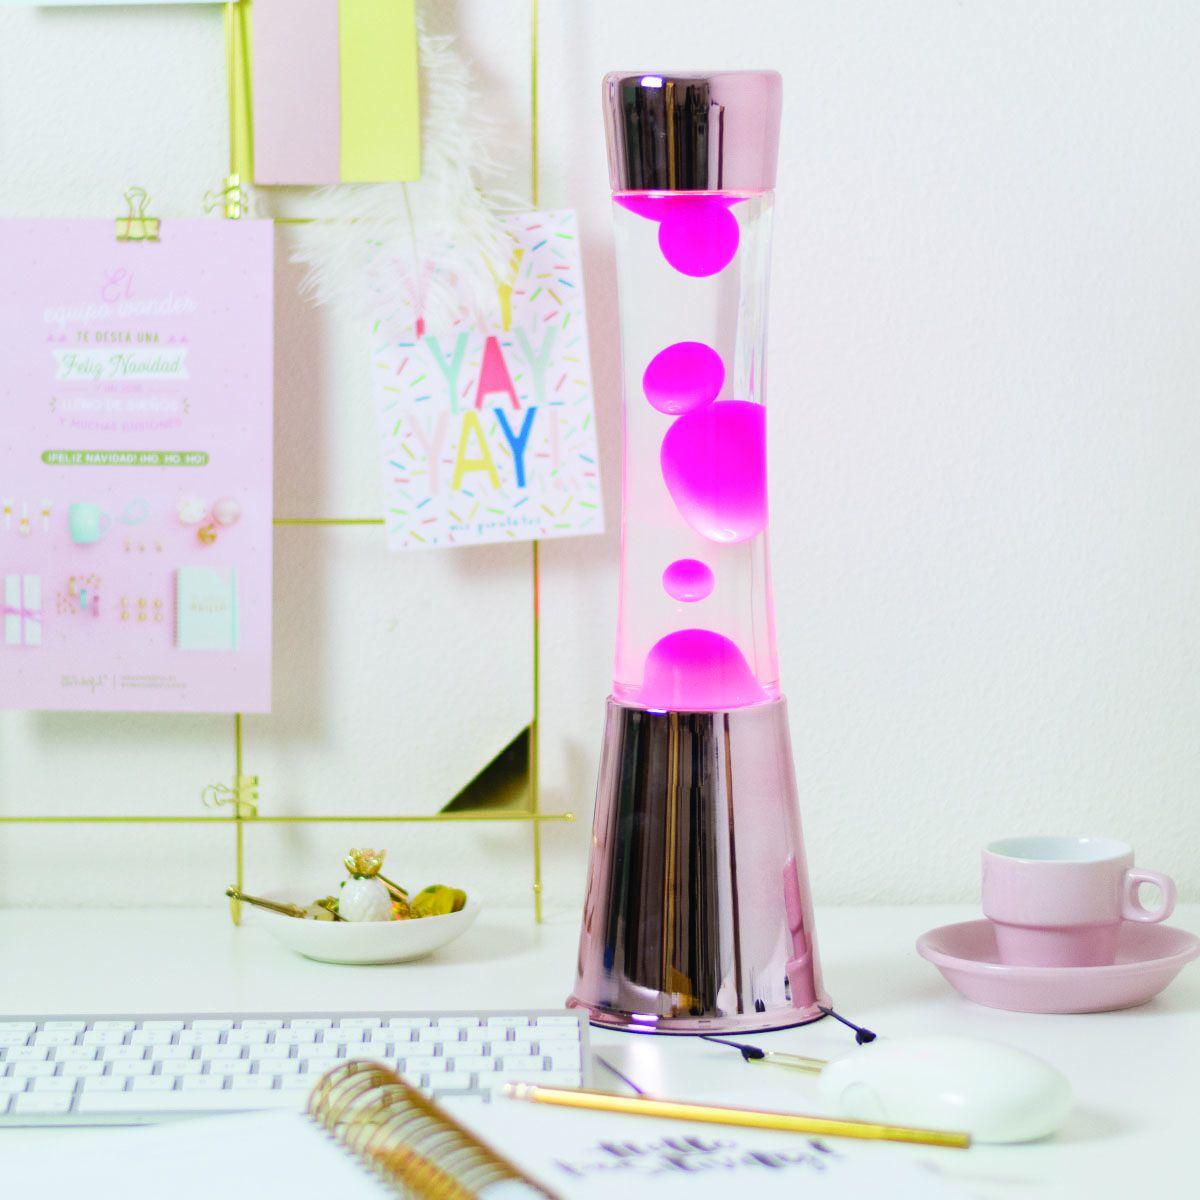 Fisura lavalamp Roze